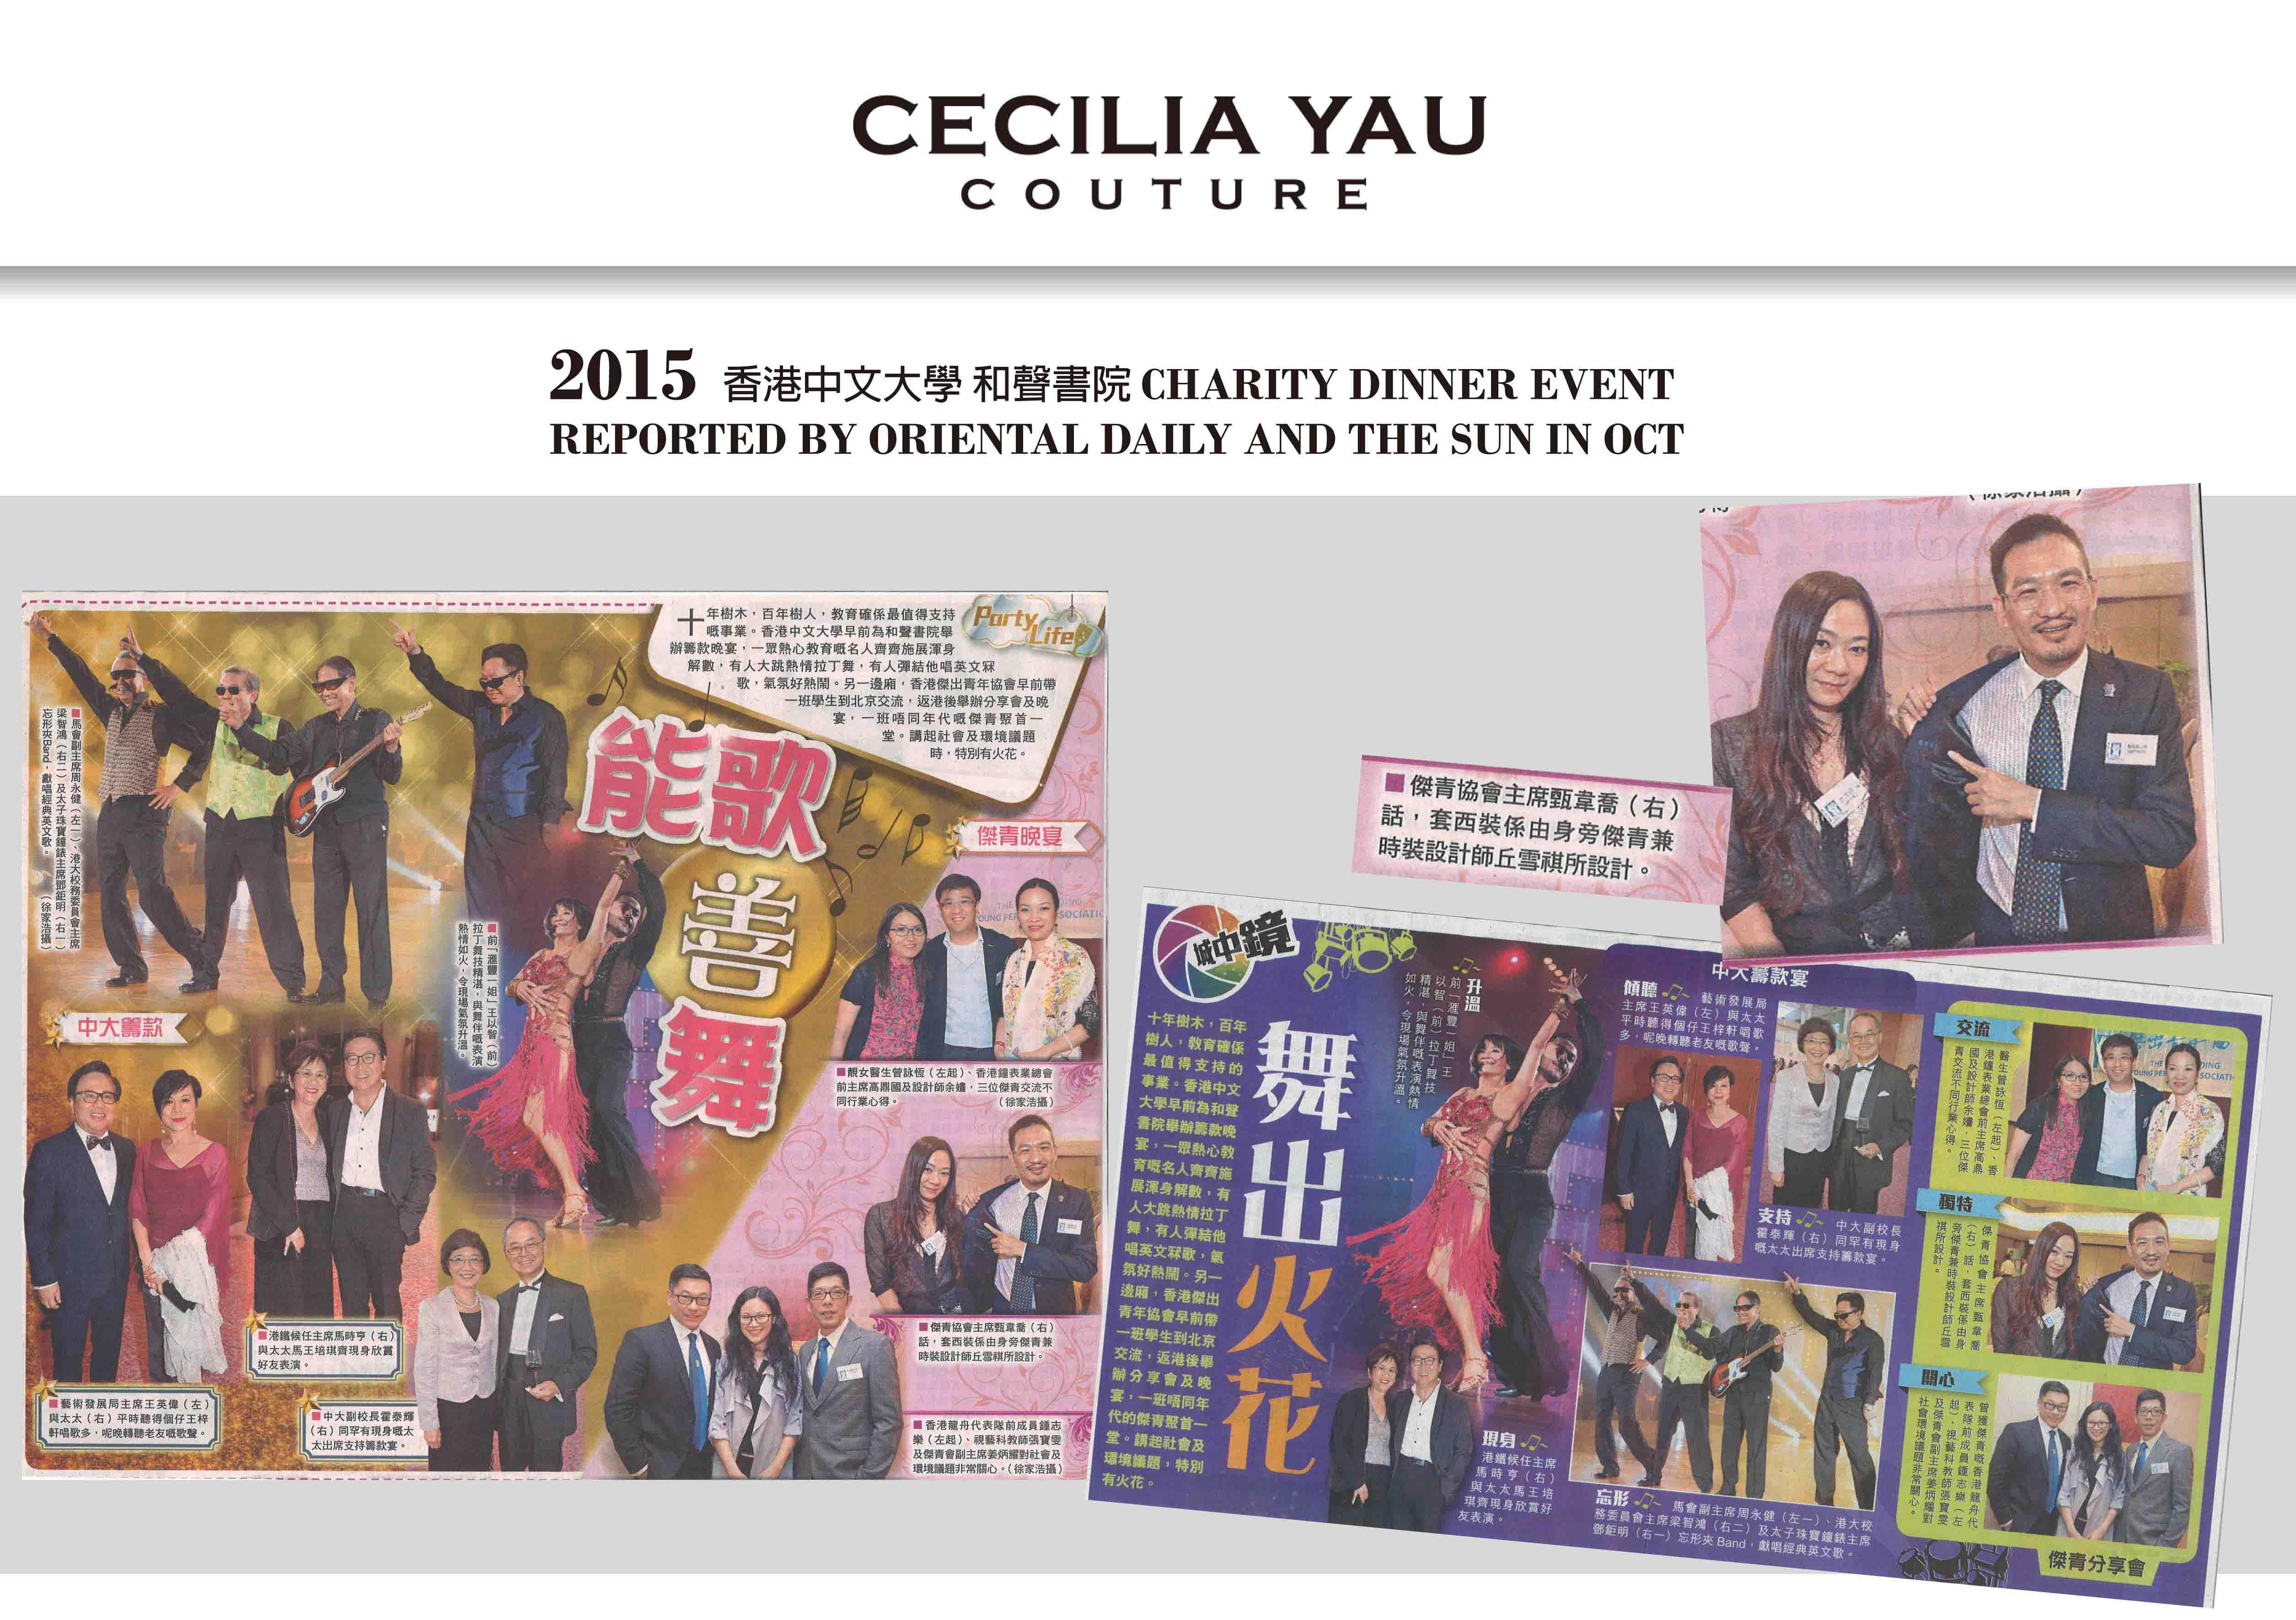 Micky Yan in Cecilia Yau suit